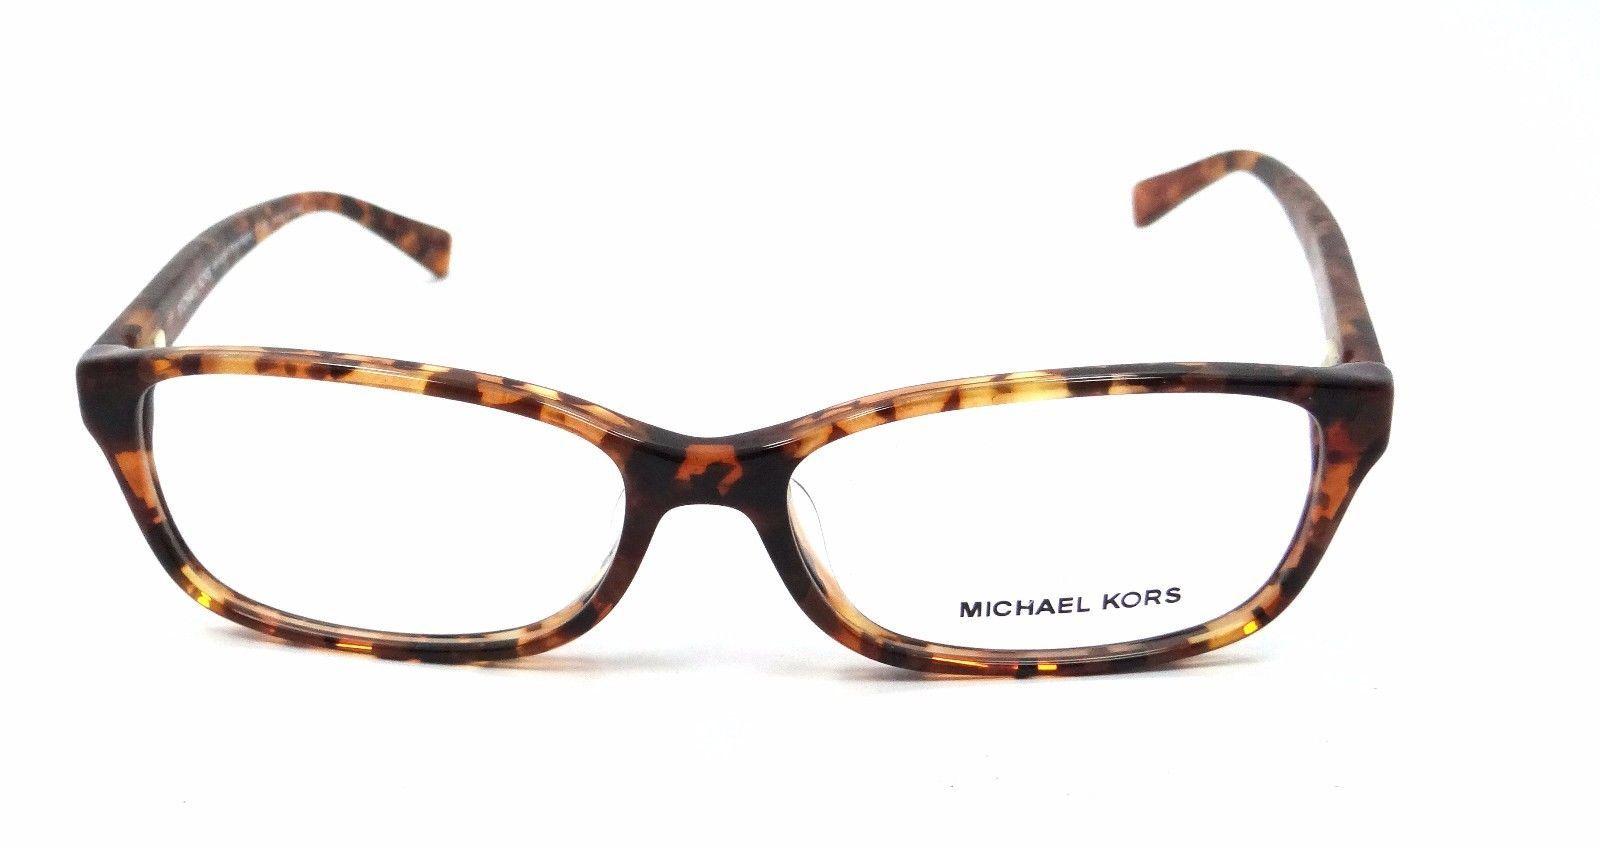 Michael Kors Rx Eyeglasses Frames MK 4024F 3066 Porto Alegre 55x15 Brwn Tortoise